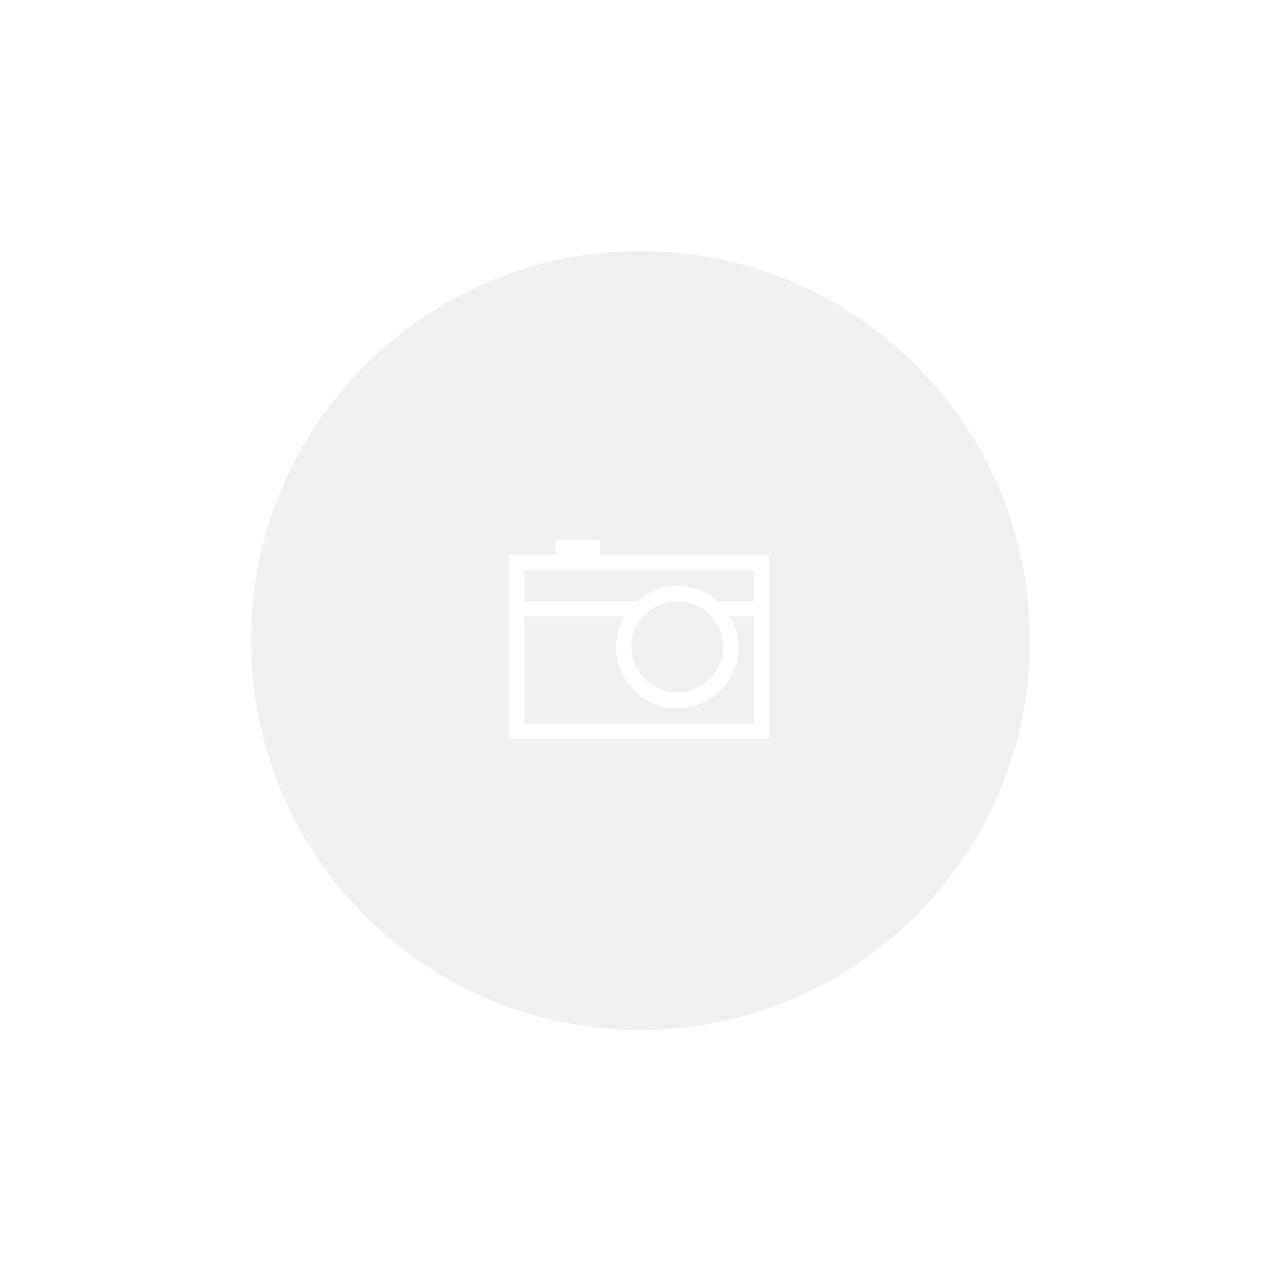 Coifa Aço Inox+vidro New Vetro 60 110v Tramontina